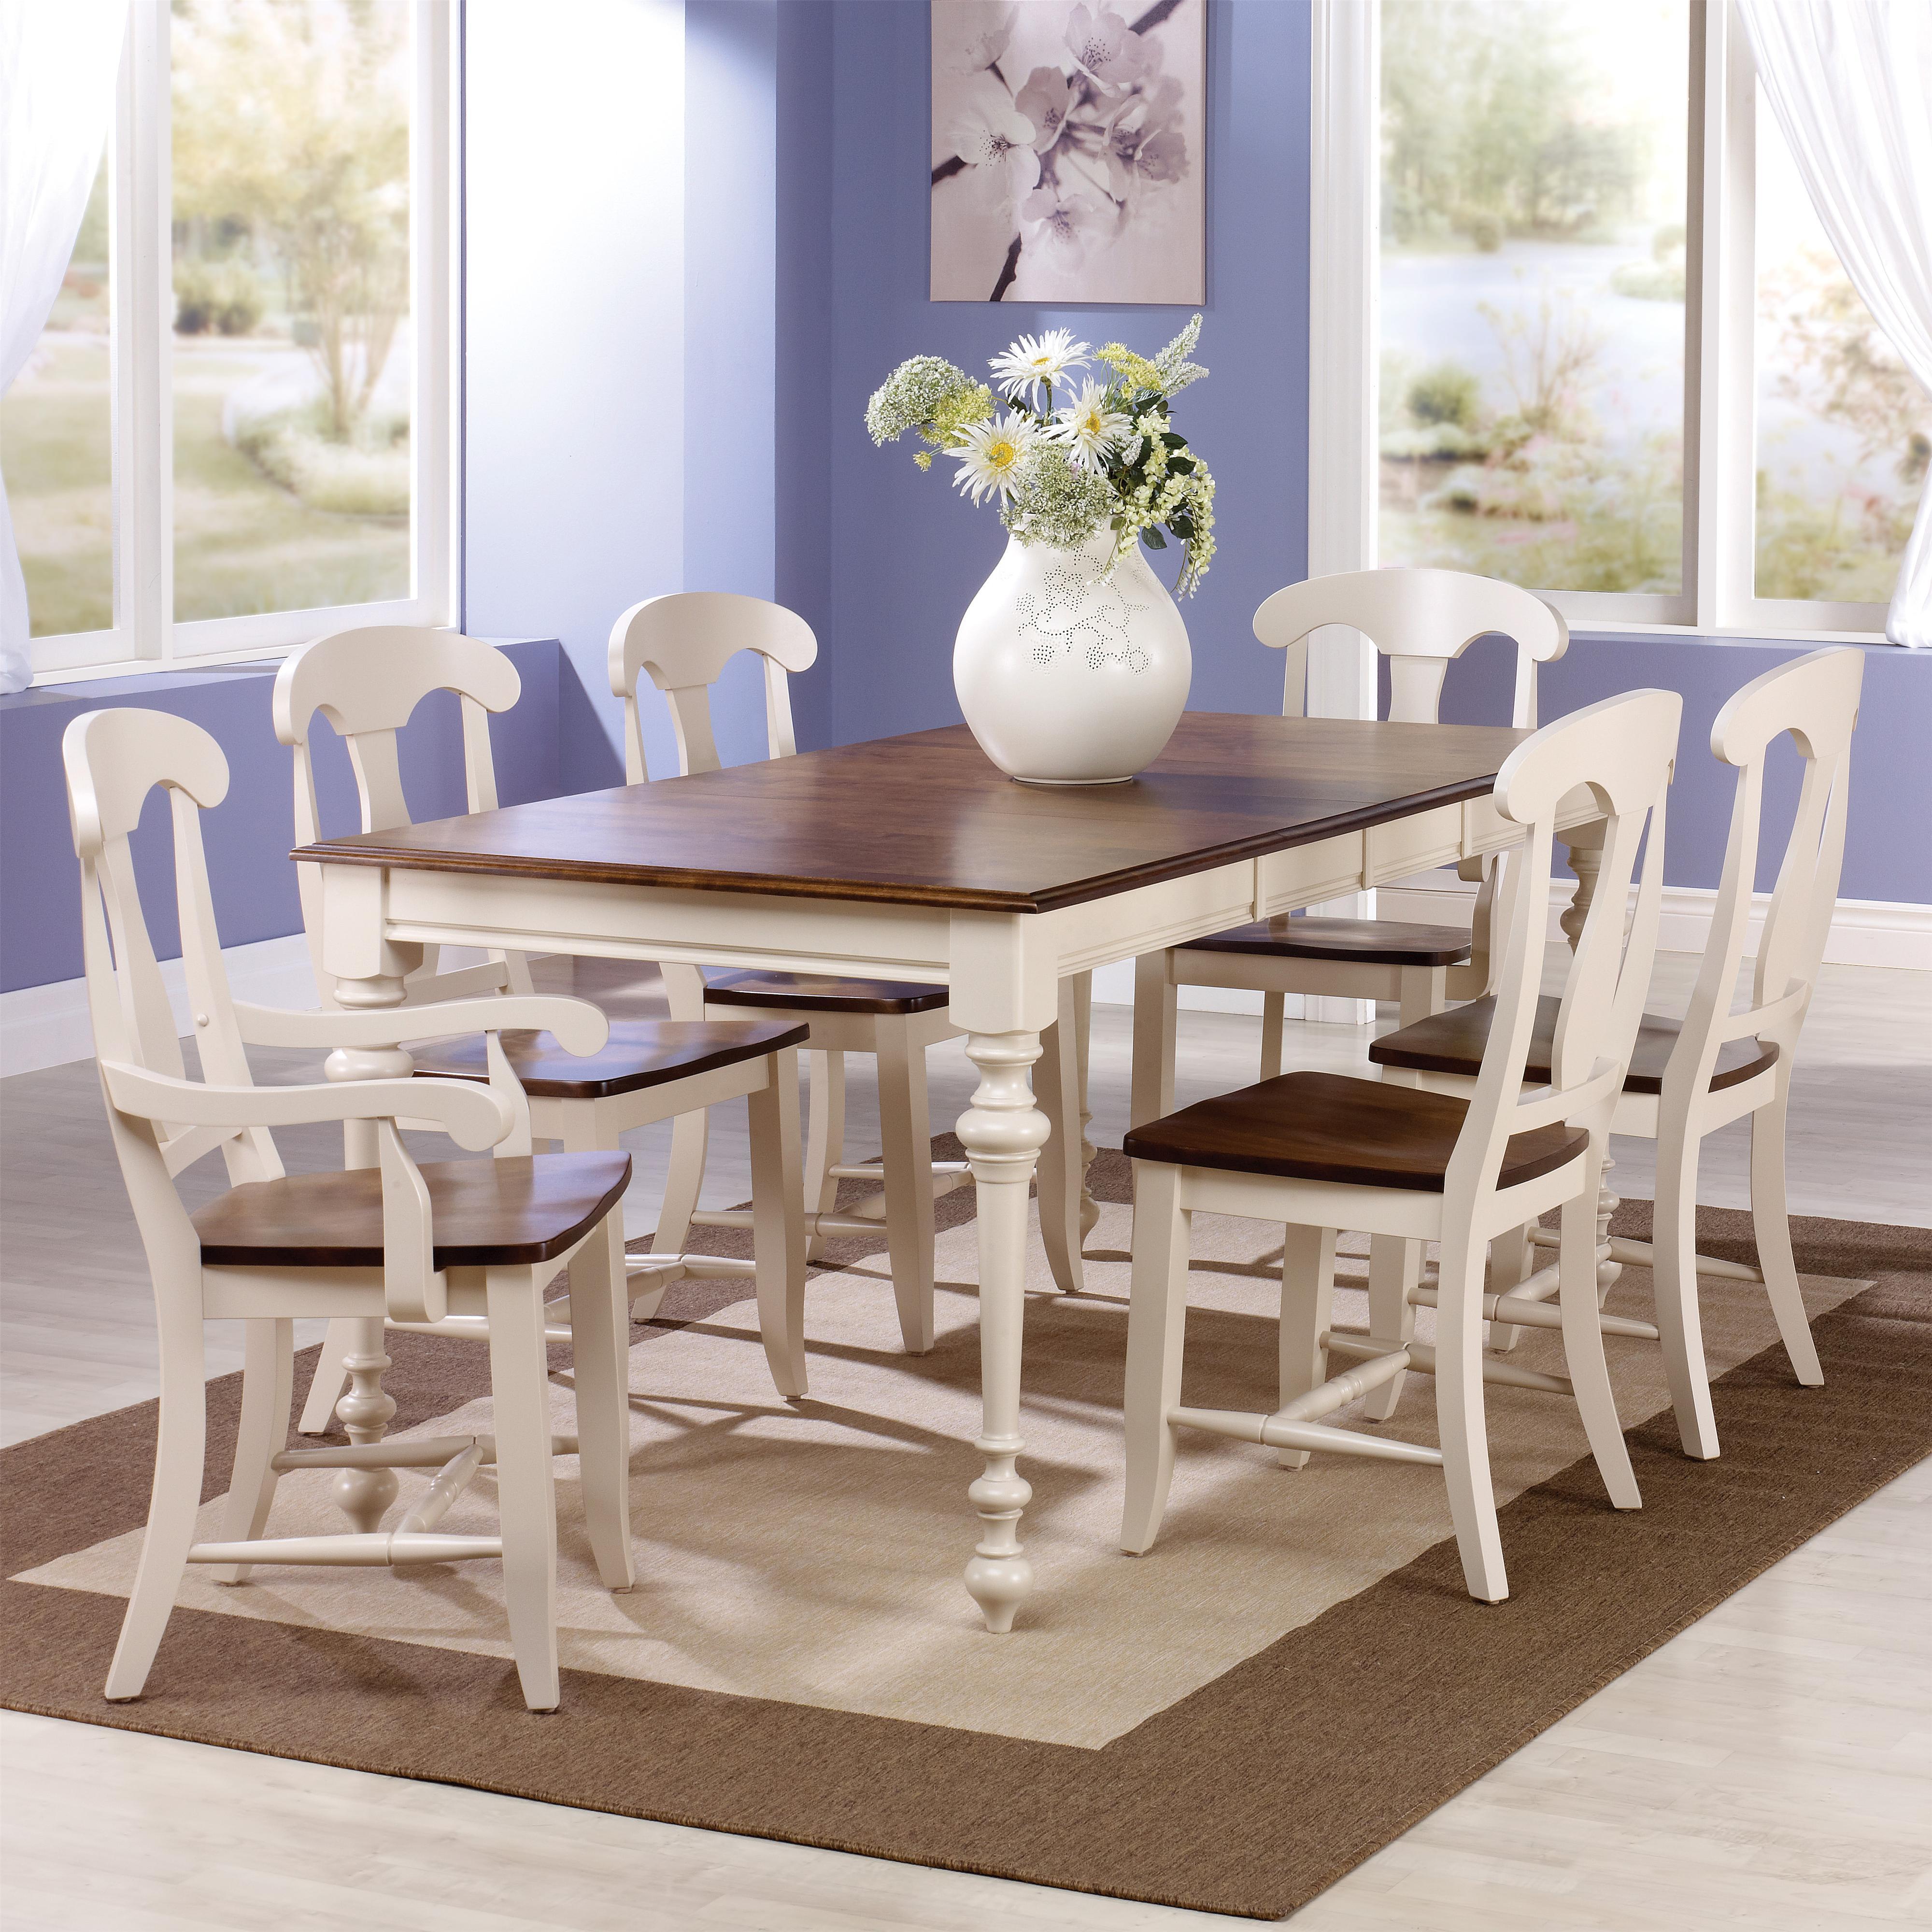 canadel custom dining customizable rectangular table with leaf set belfort furniture dining. Black Bedroom Furniture Sets. Home Design Ideas